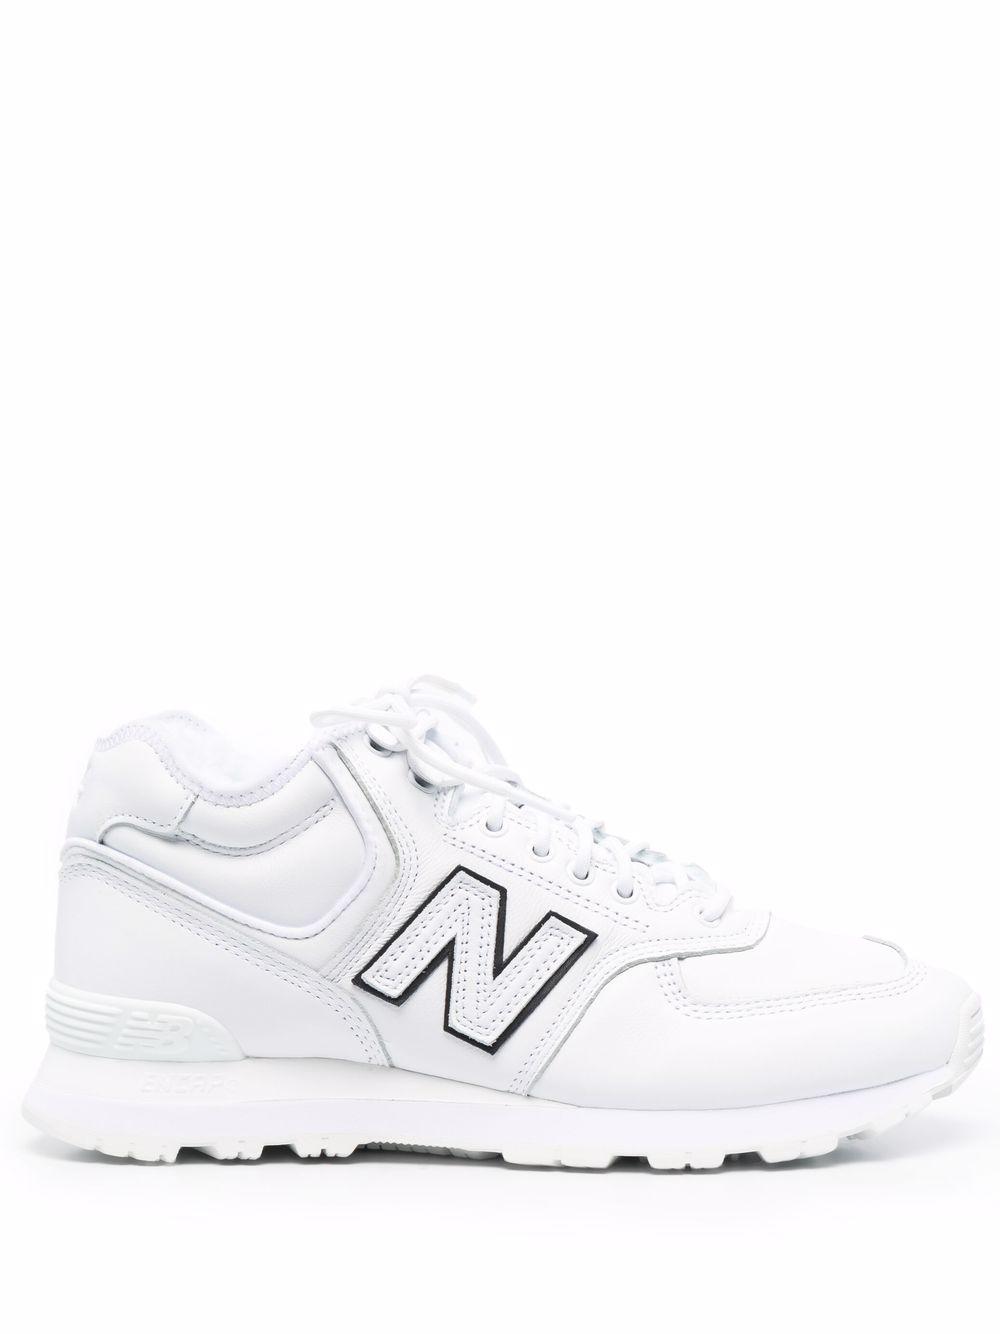 Sneaker watanabe x new balance